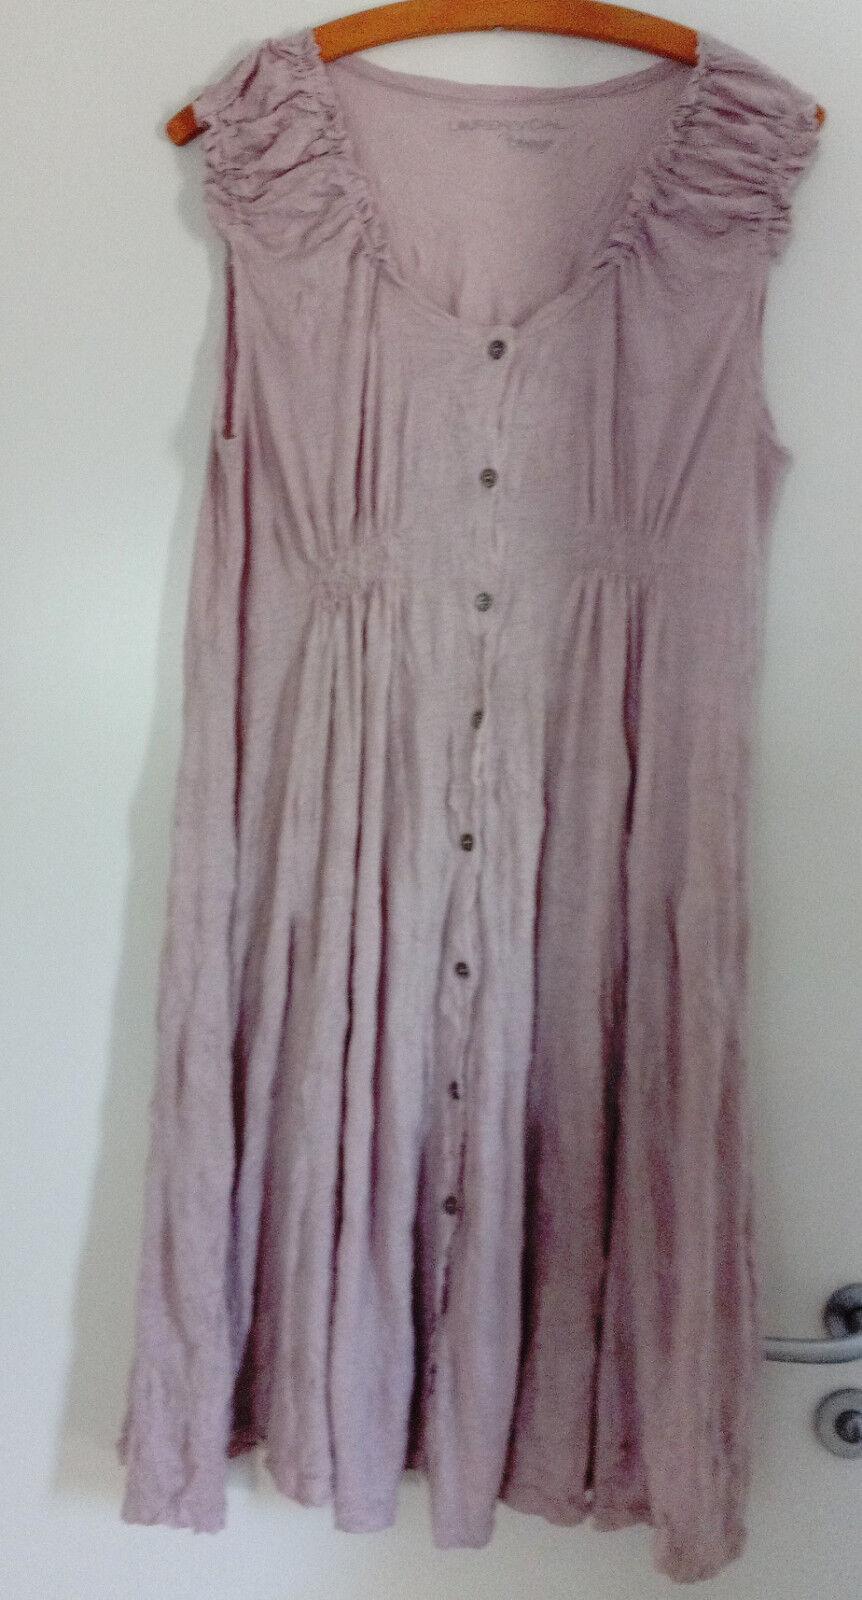 Lauren Vidal Kleid Gr. M ( 40 42 44  ) flieder Rosa  NP   BW 44 cm